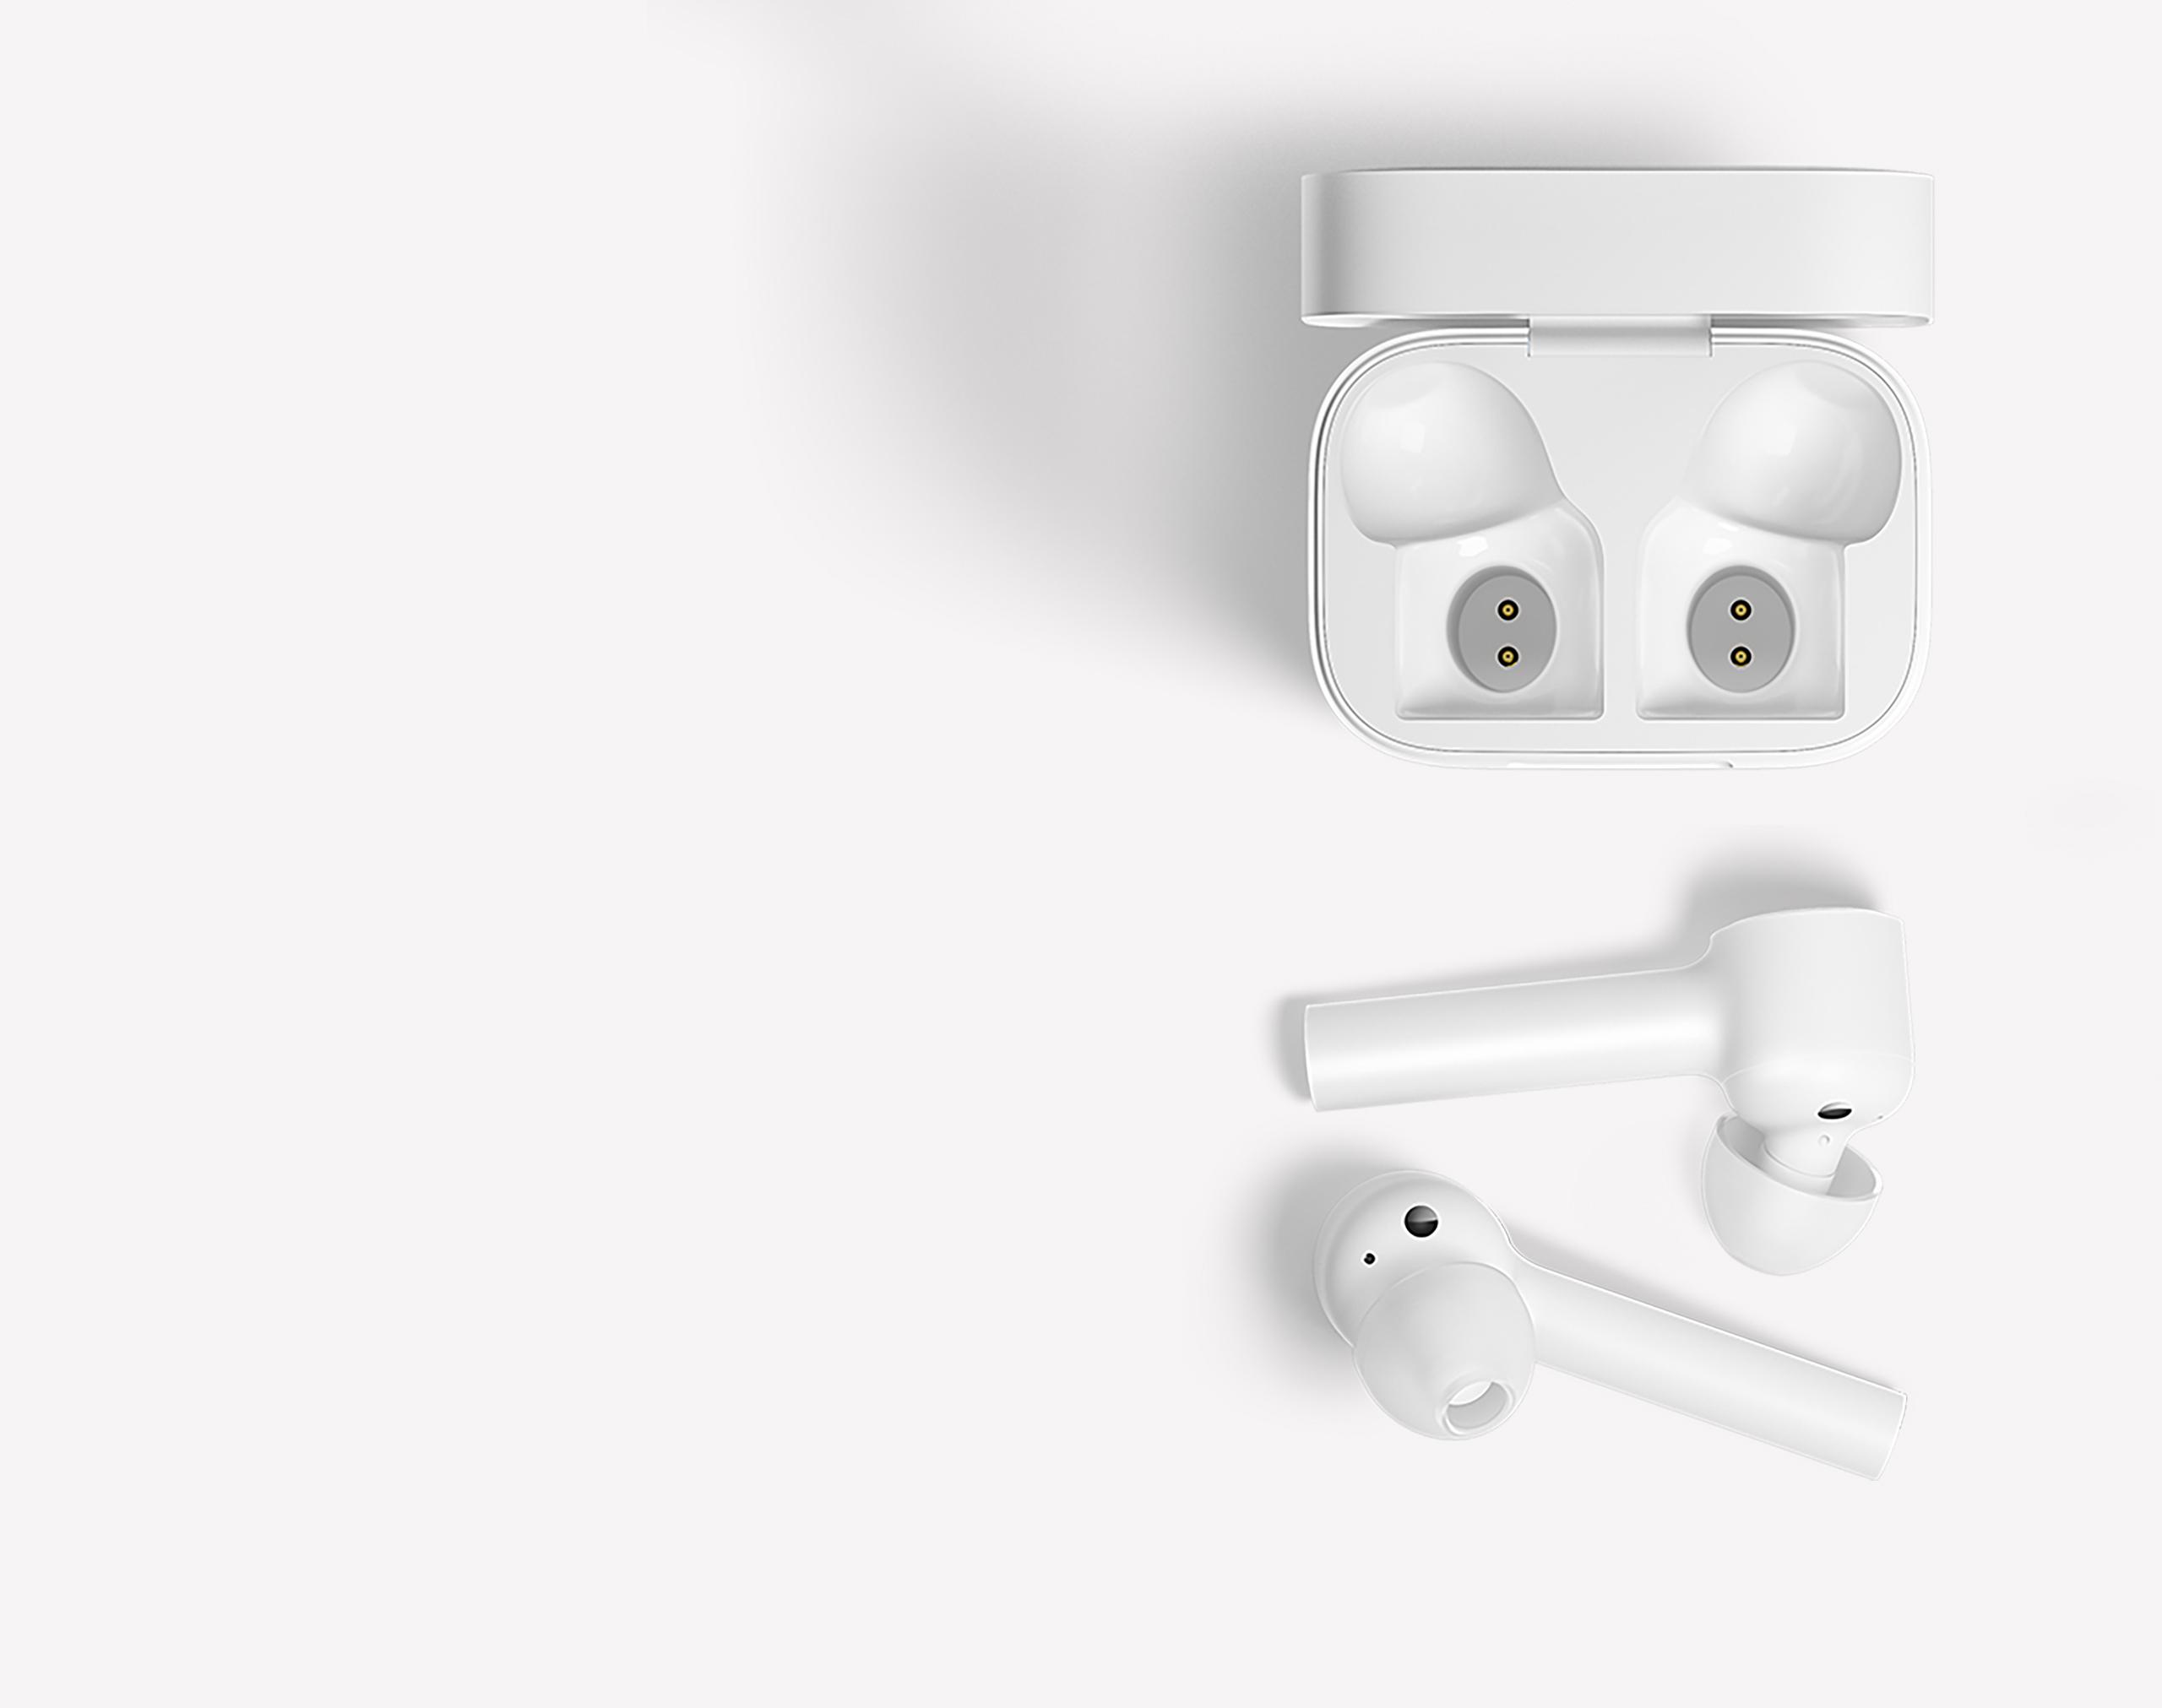 https://i01.appmifile.com/webfile/globalimg/products/pc/mi-true-wireless-earphones/section-11.jpg